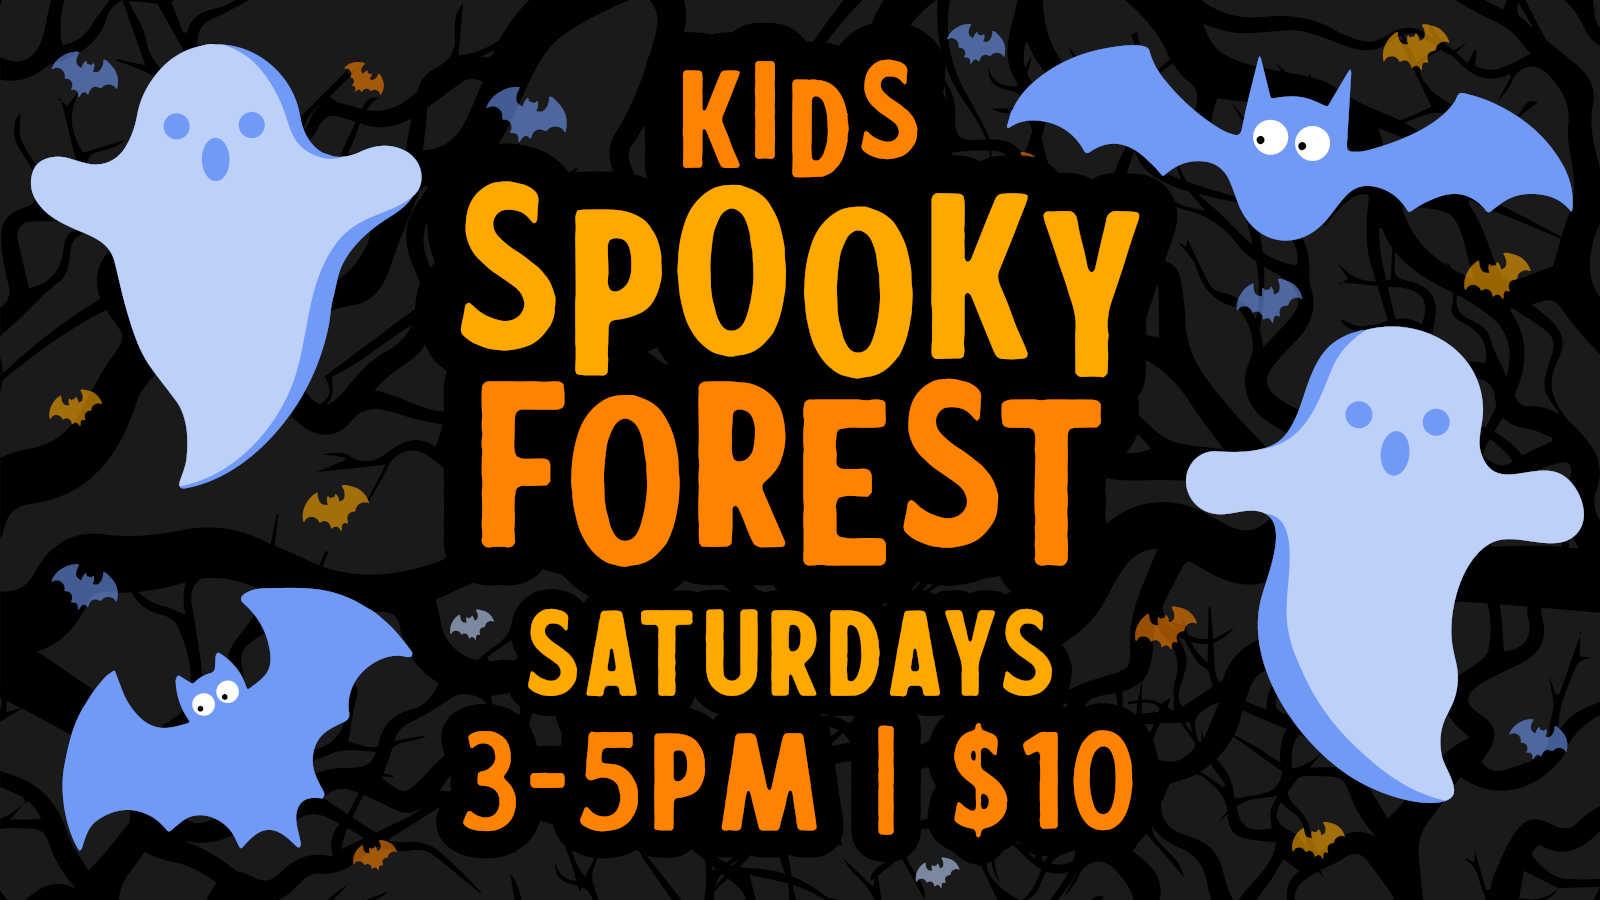 KidsSpookyForestSat_FB